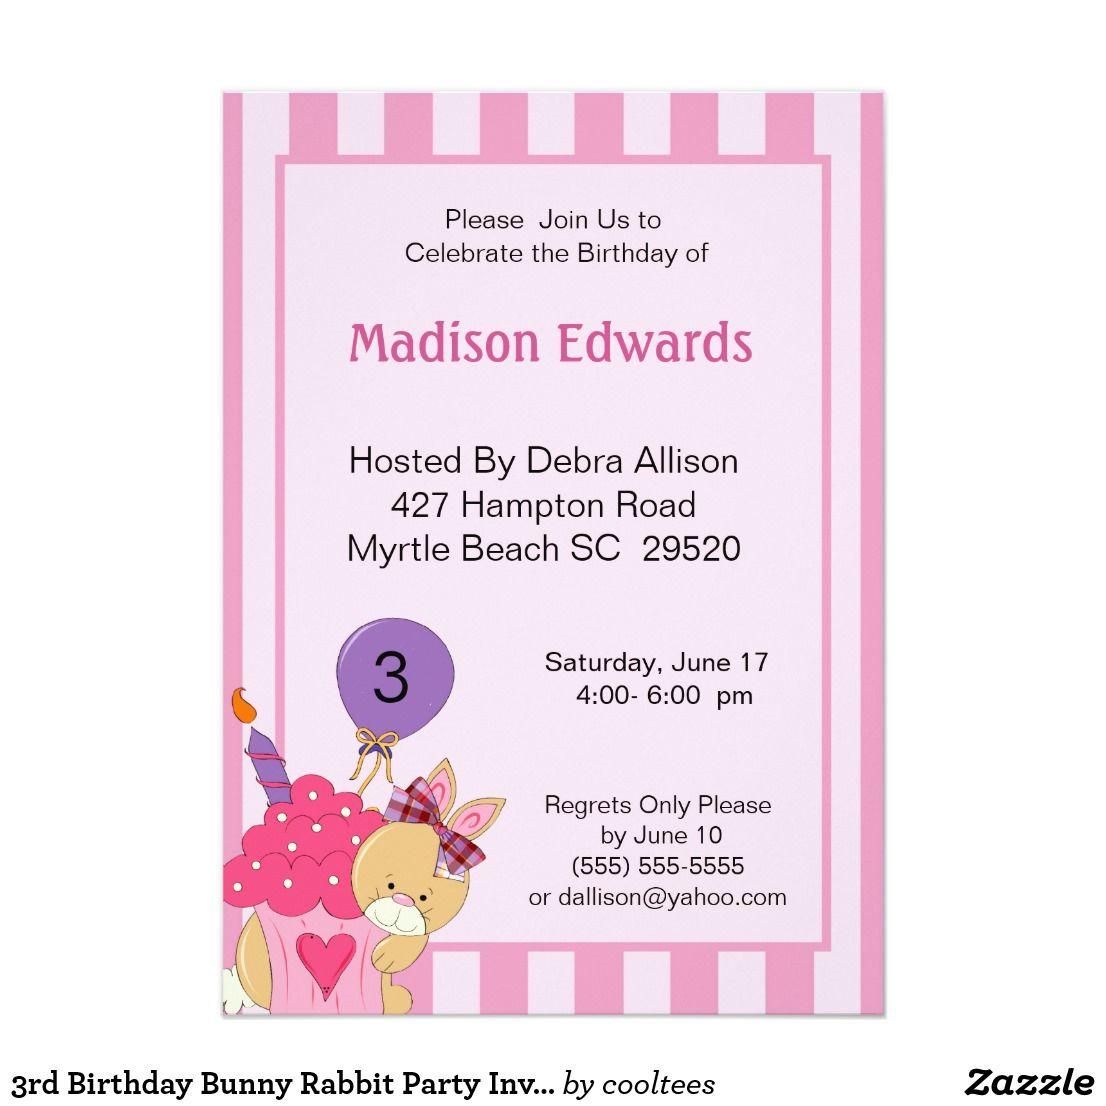 3rd Birthday Bunny Rabbit Party Invitation | Pinterest | Bunny ...